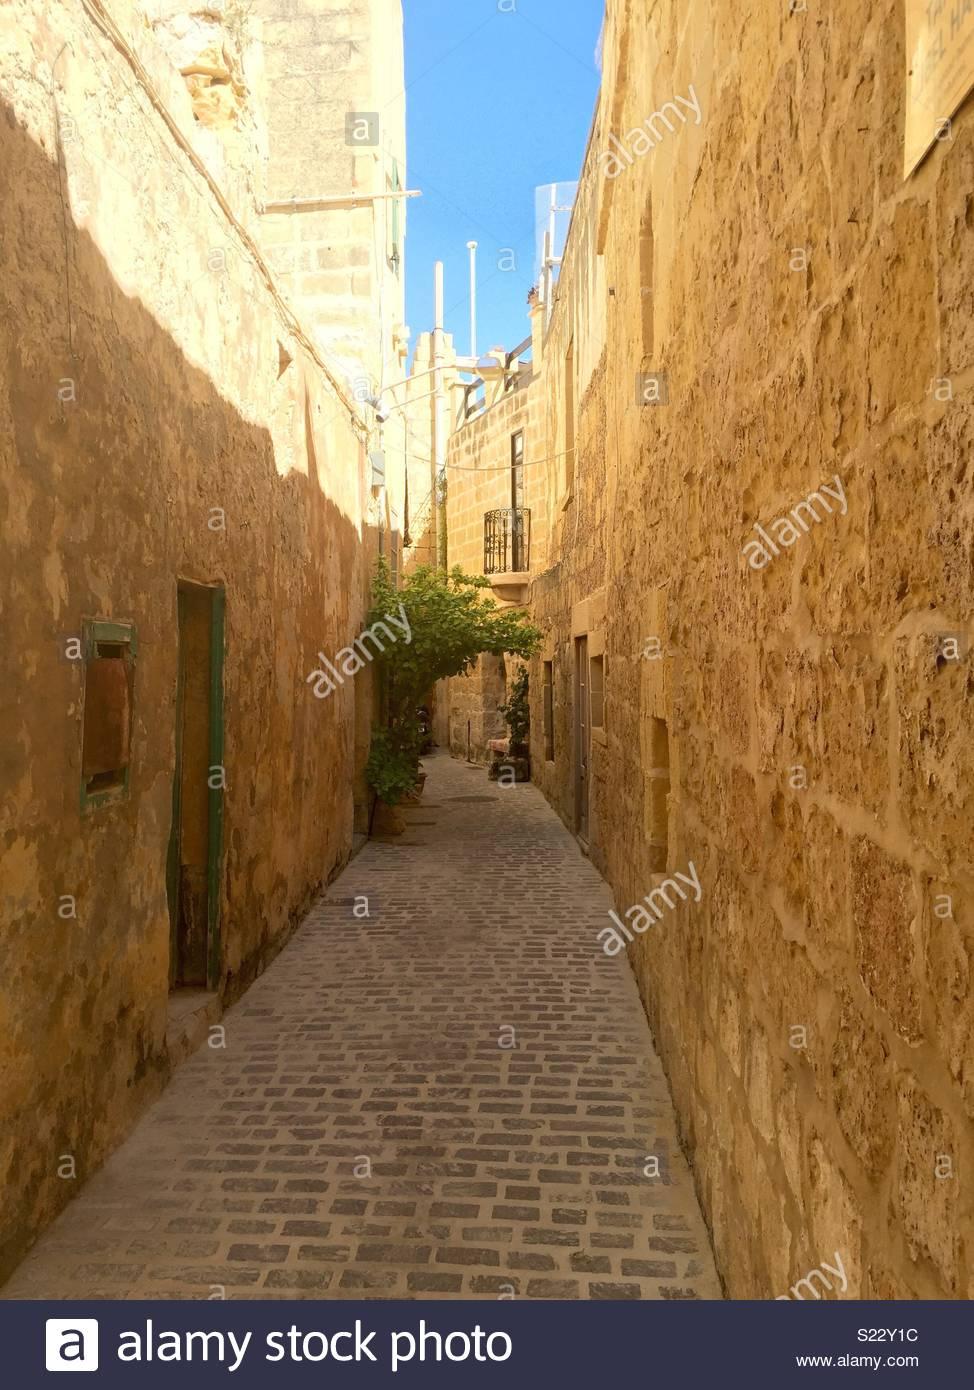 A street in Valletta - Stock Image